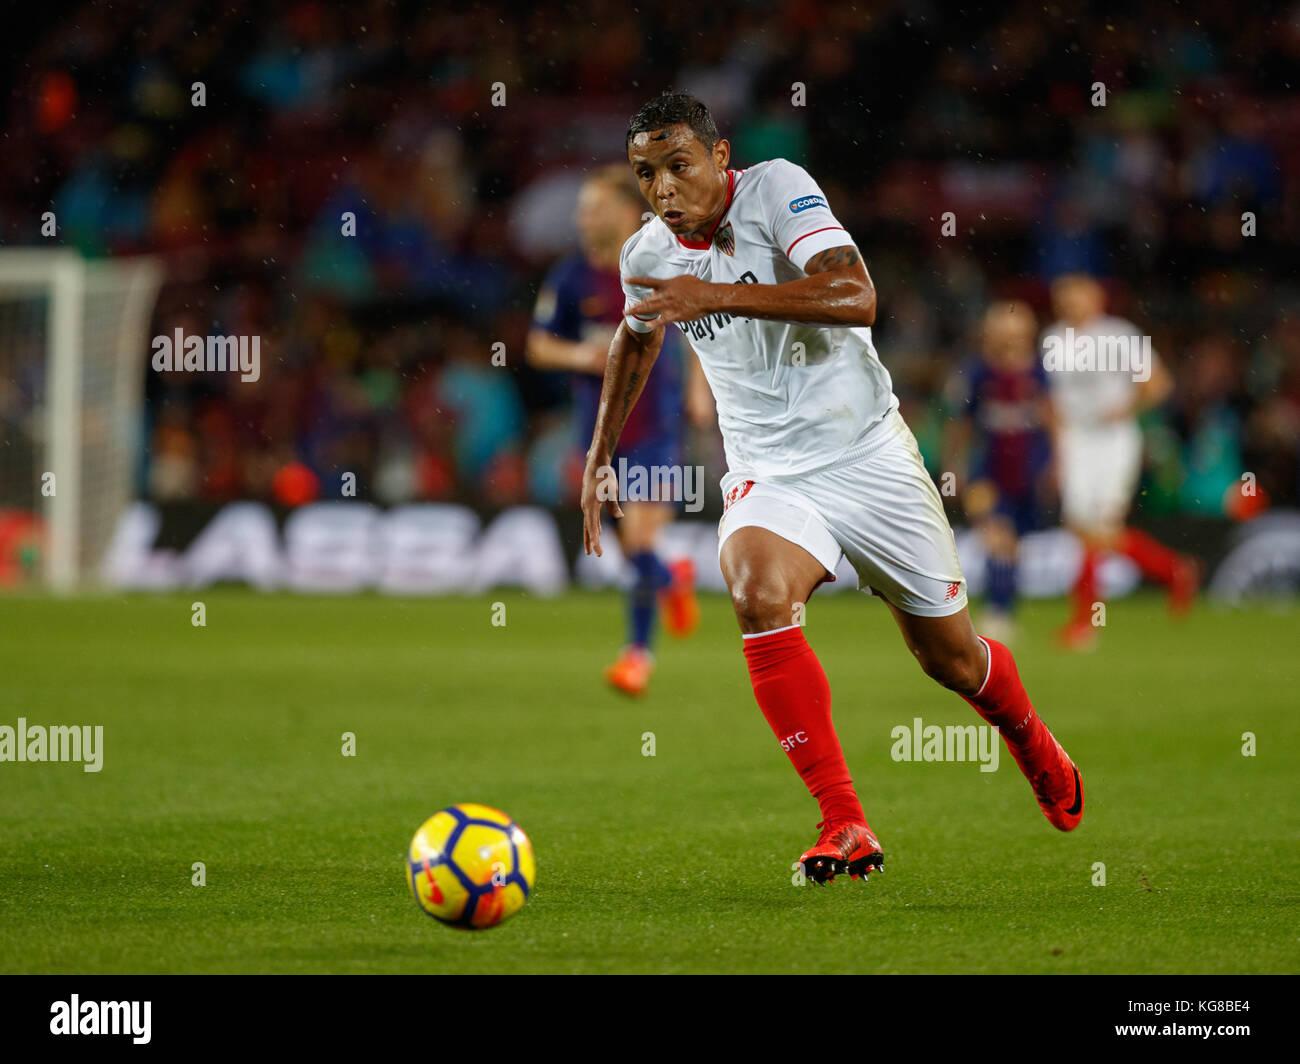 Barcelona, Spain. 4th November, 2017. Match between FC Barcelona and Sevilla FC in Camp Nou stadium. Muriel Credit: - Stock Image